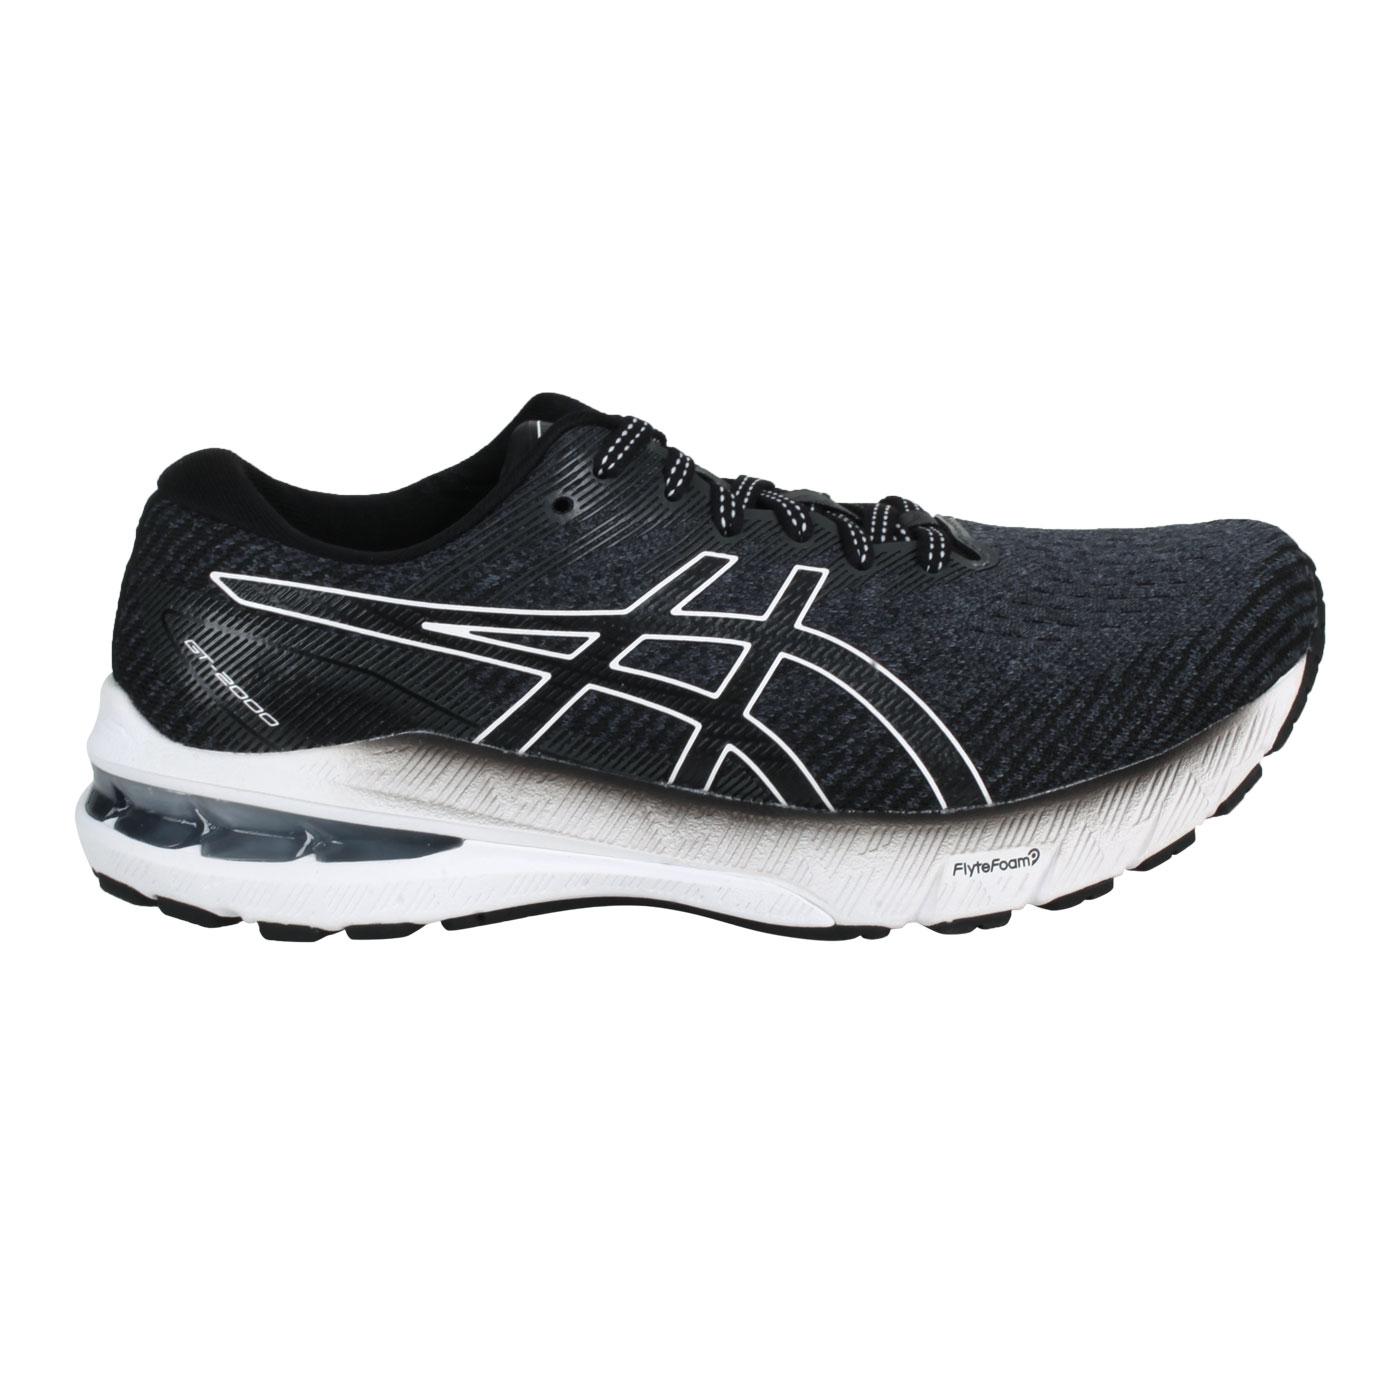 ASICS 女款慢跑鞋-2E  @GT-2000 10@1012B043-002